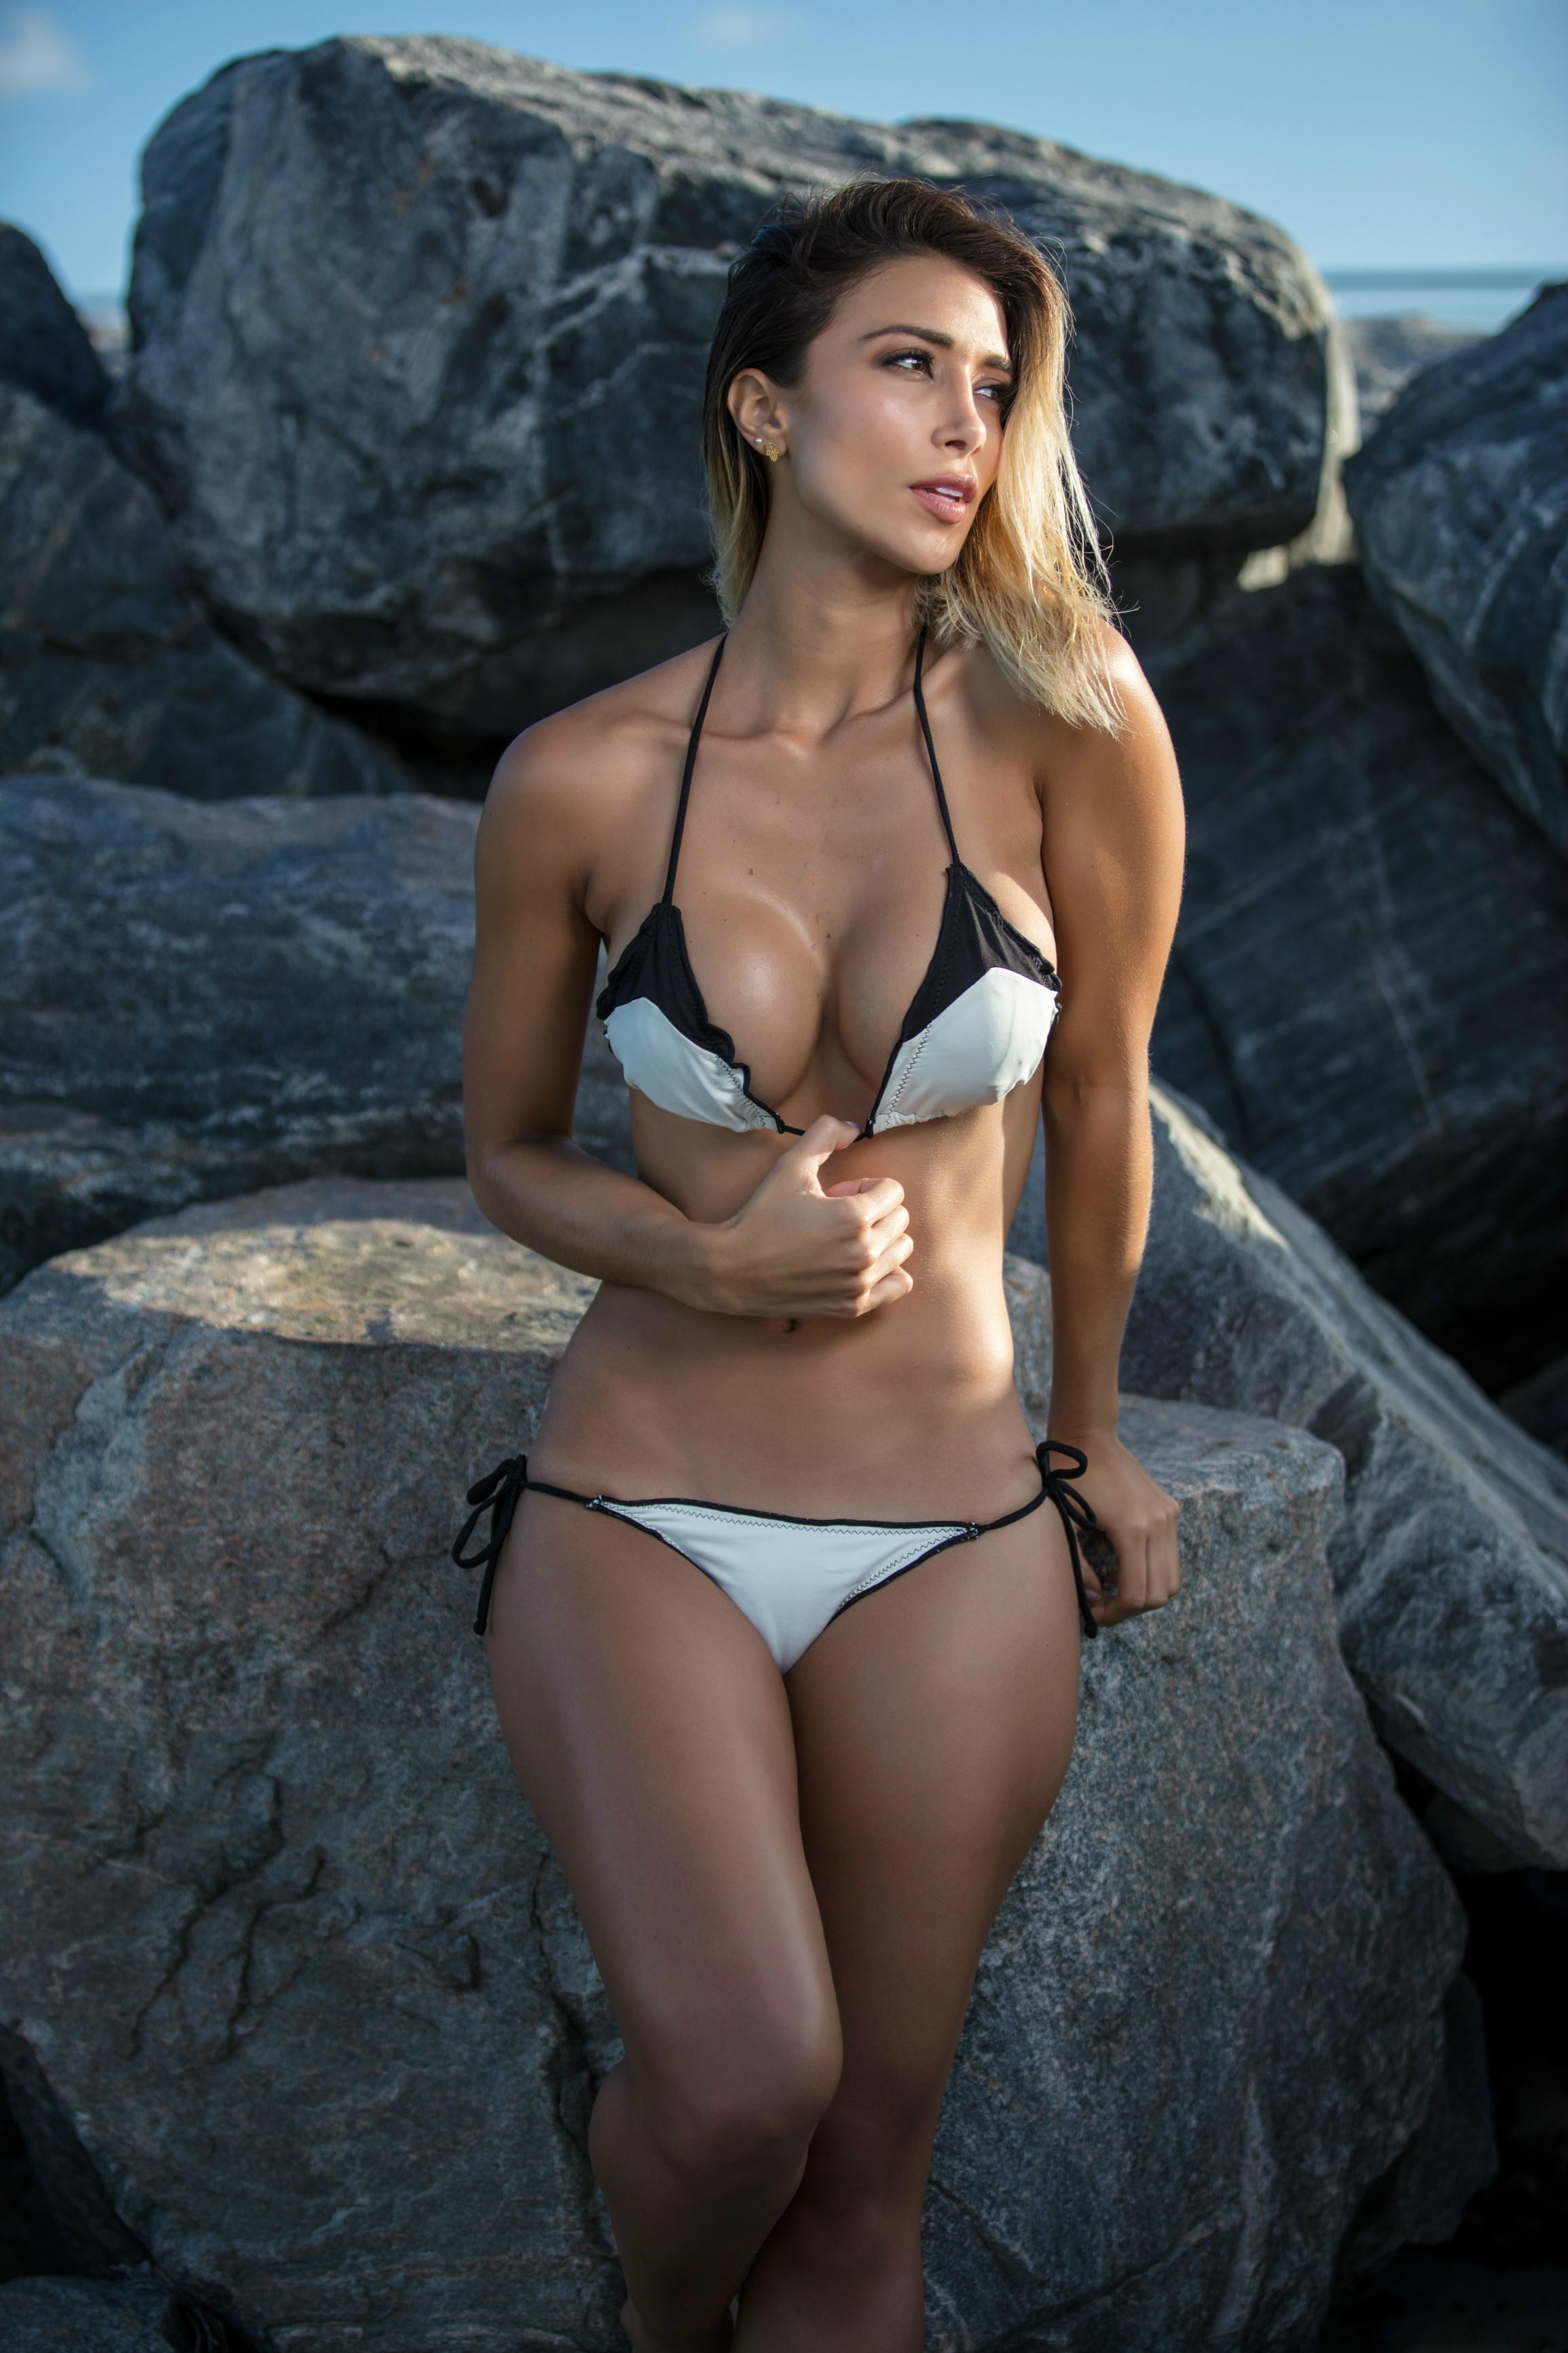 Bikini Valeria Moreno nudes (36 photo), Topless, Hot, Feet, cleavage 2015